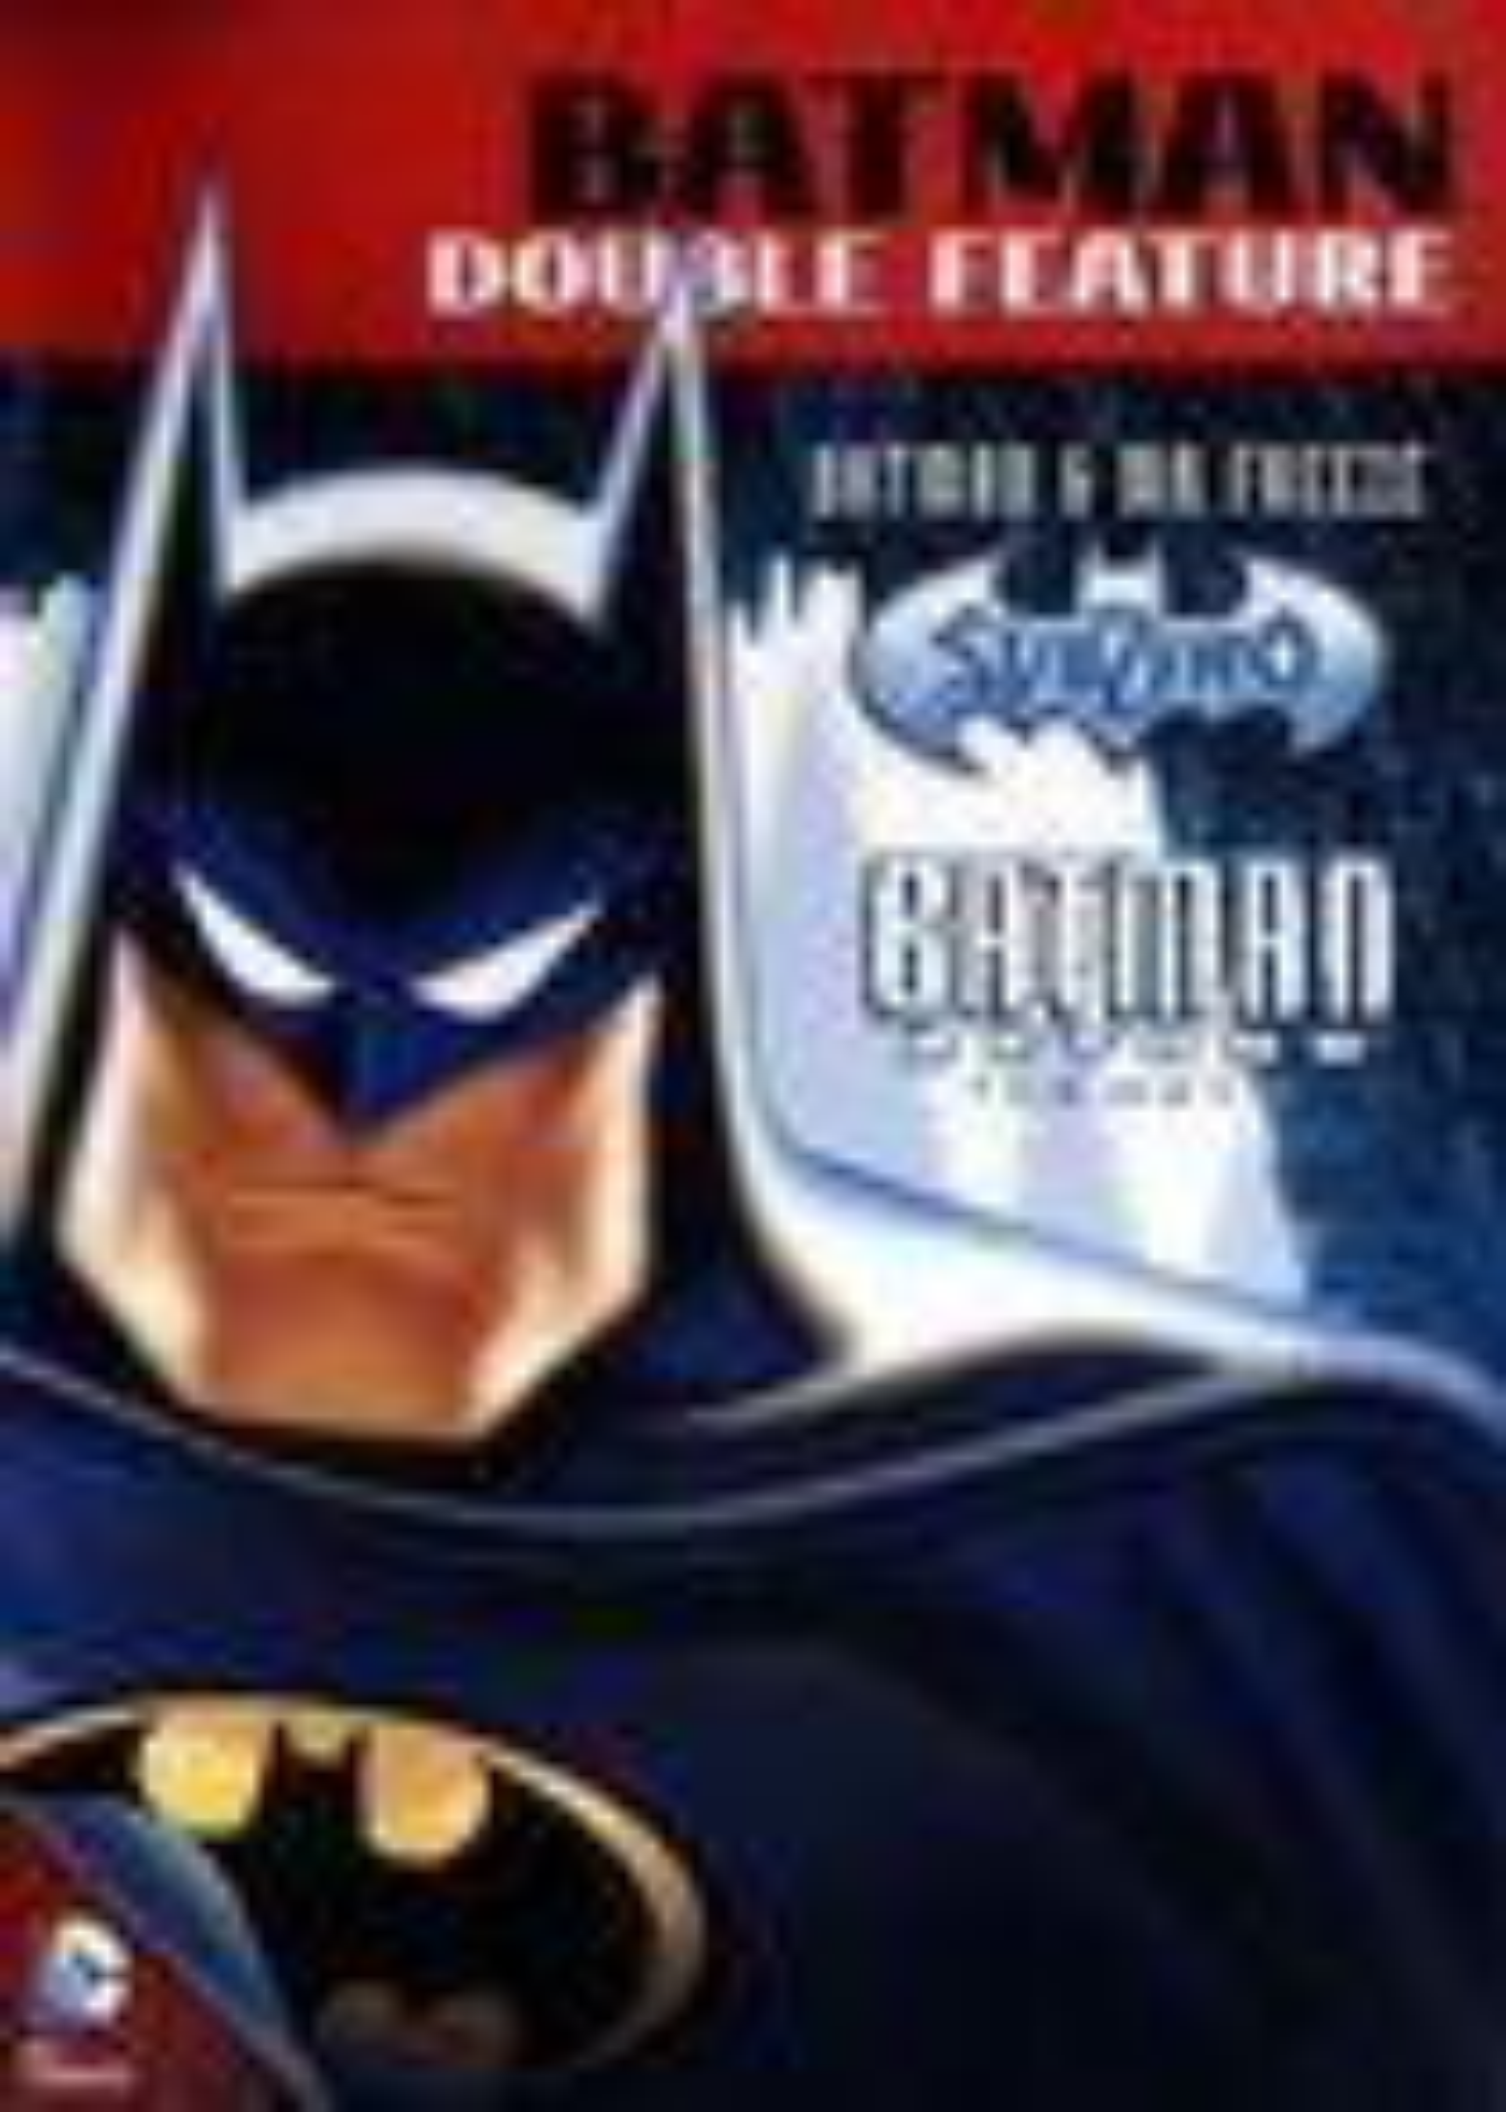 Batman & Mr. Freeze: Subzero/batman Beyond: The Movie [2 Discs] (dvd) 6749321